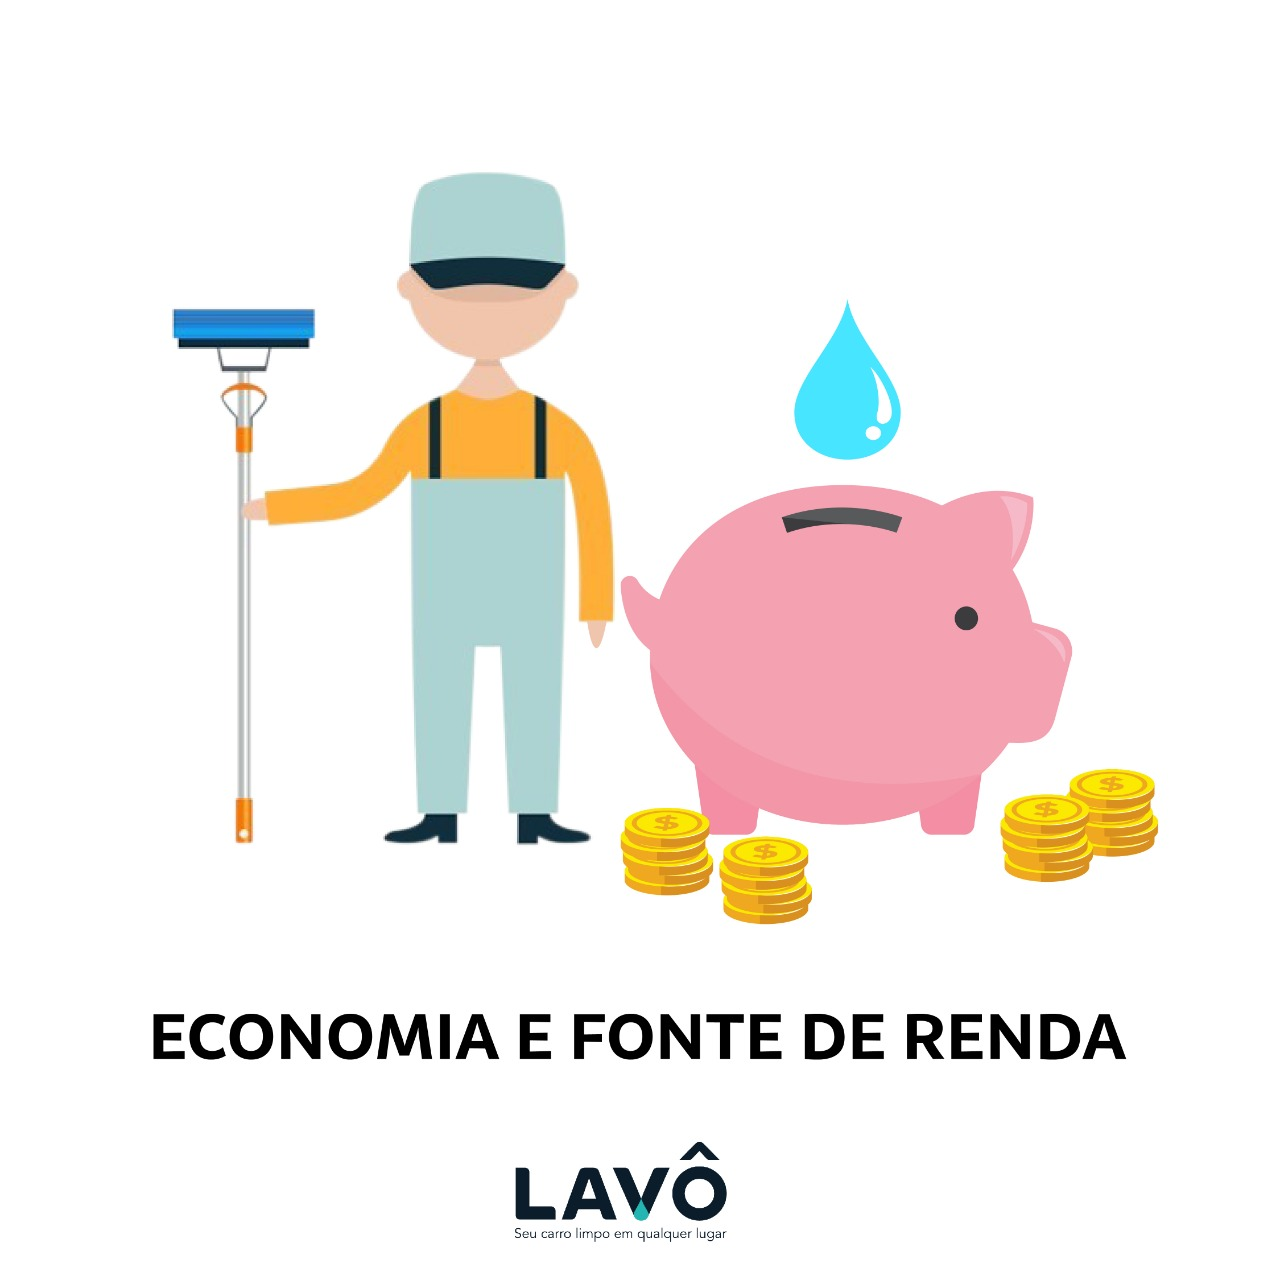 economia e fonte de renda